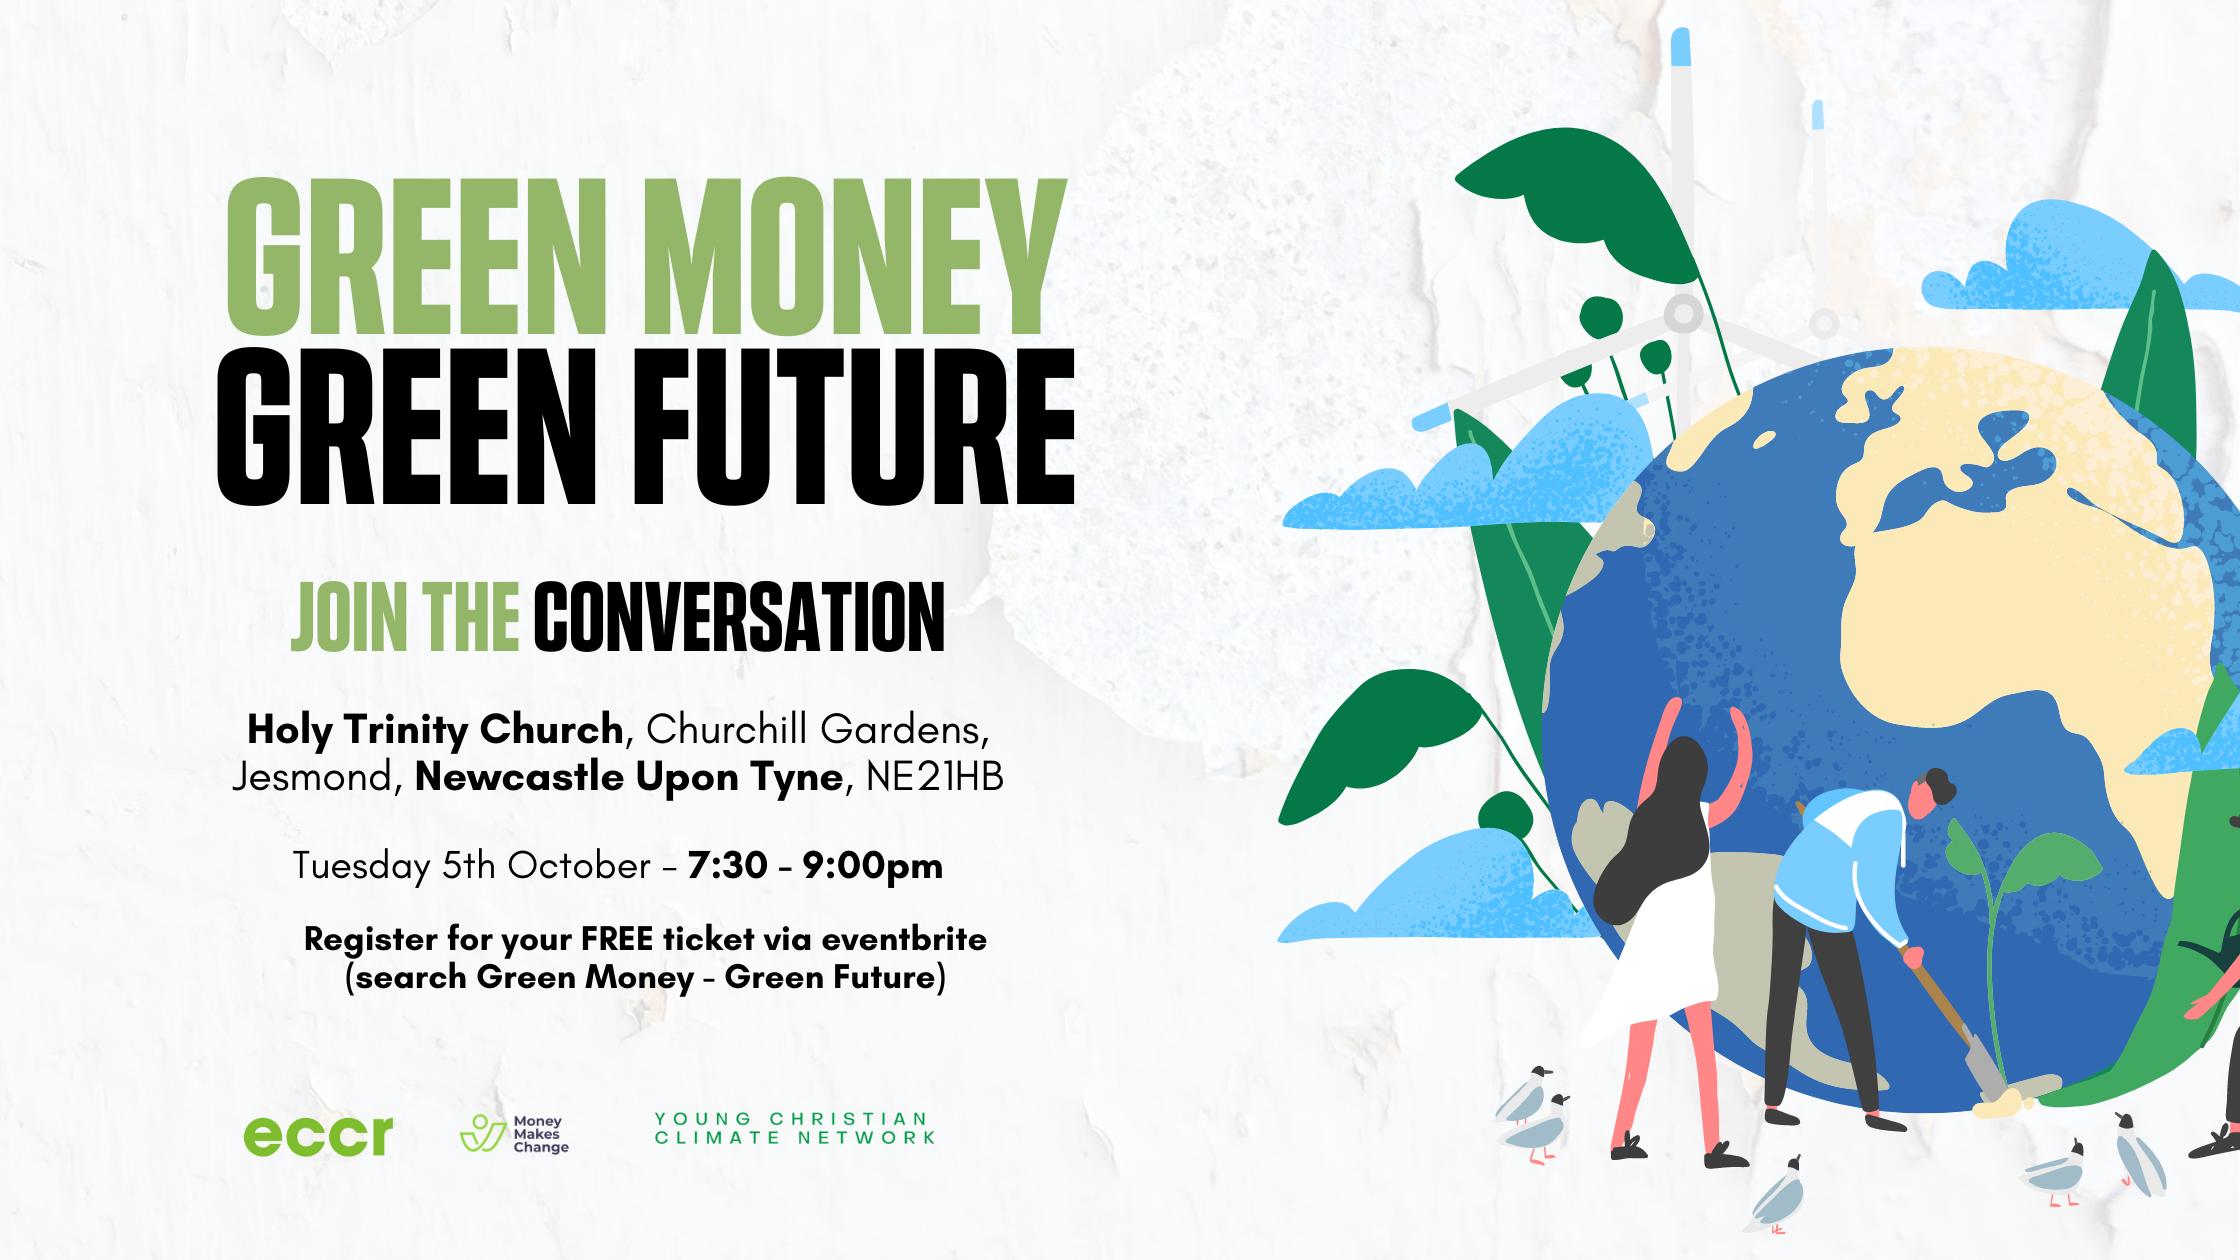 Green Money : Green Future – Join the conversation